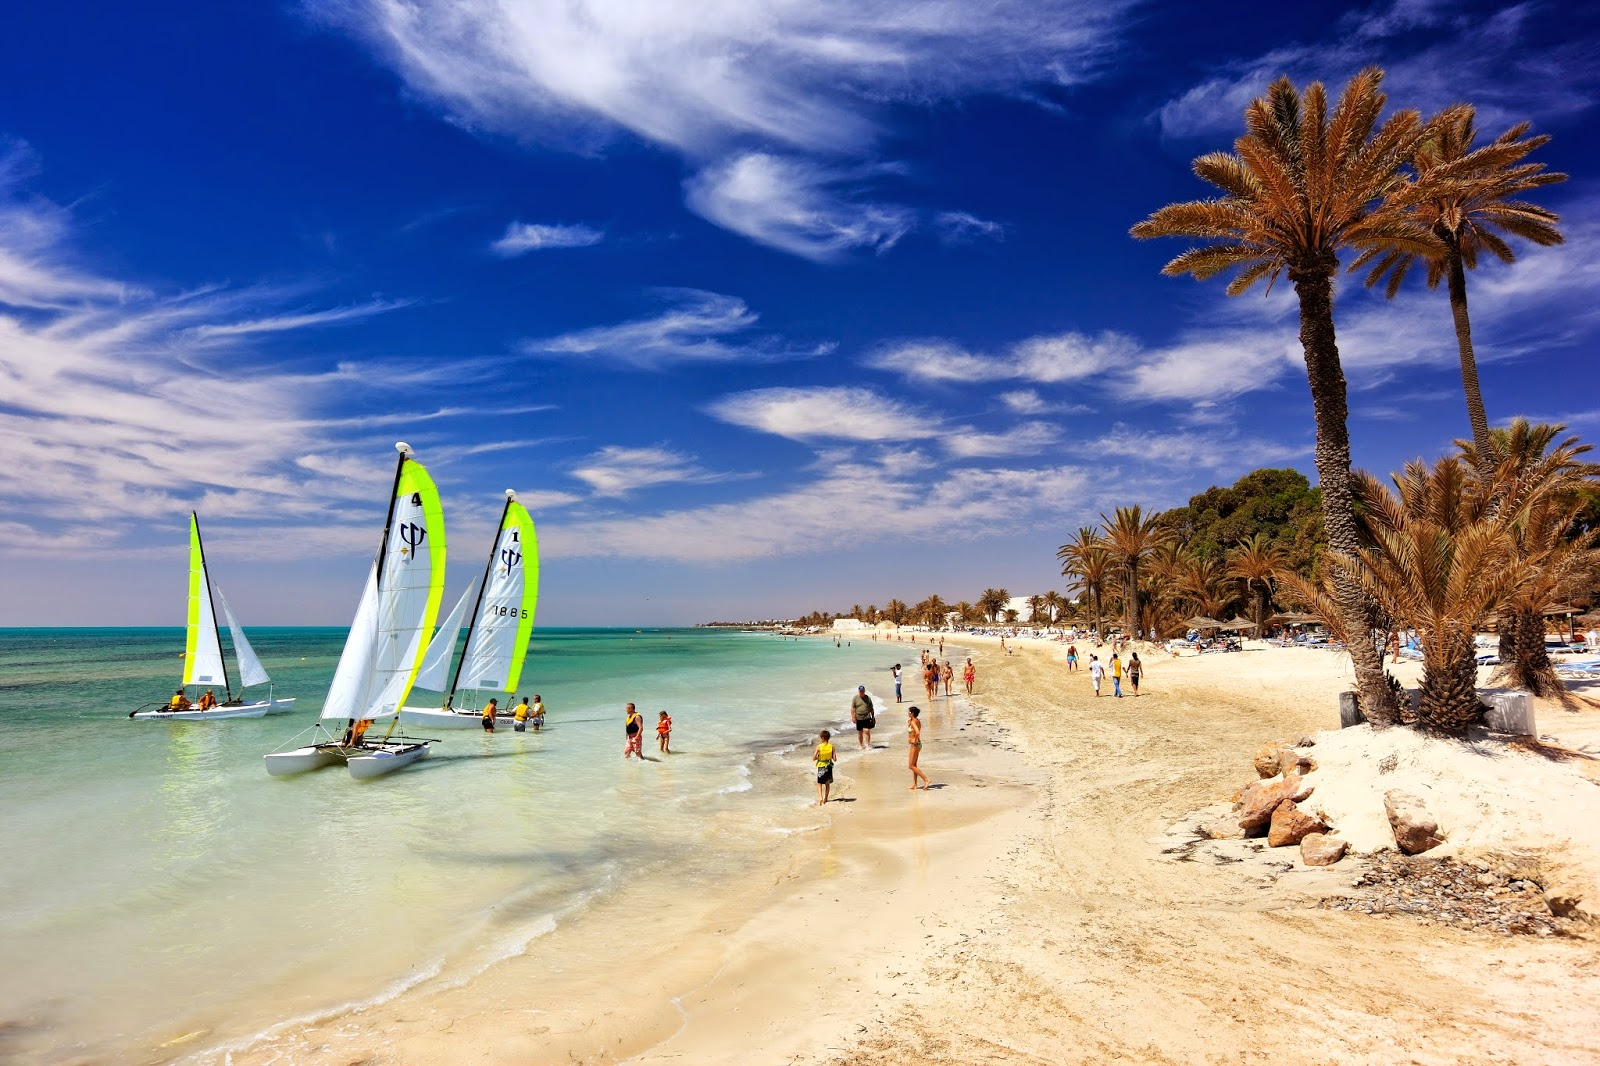 Пляж джерба тунис фото